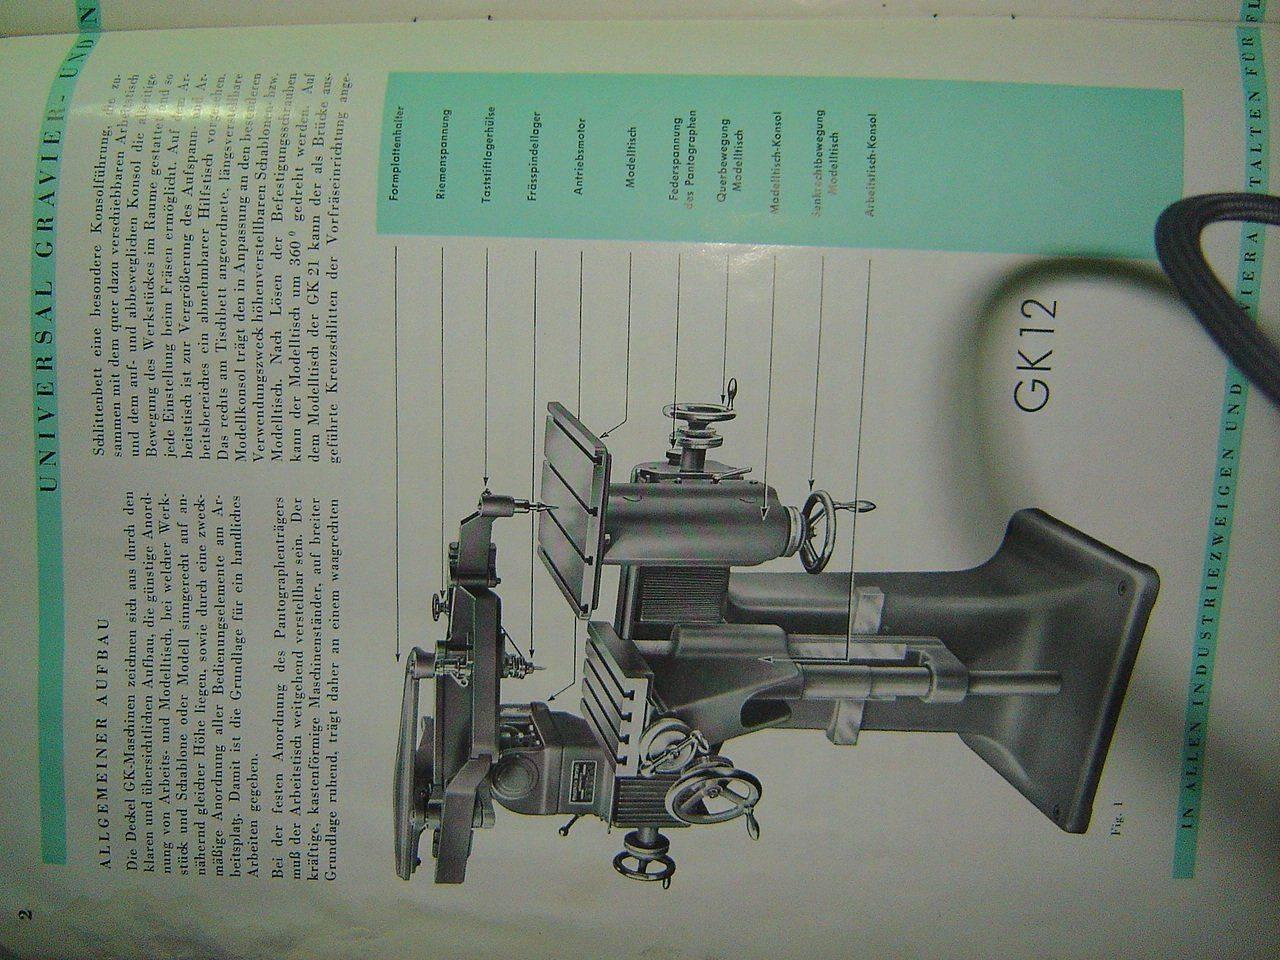 DSC04079.JPG